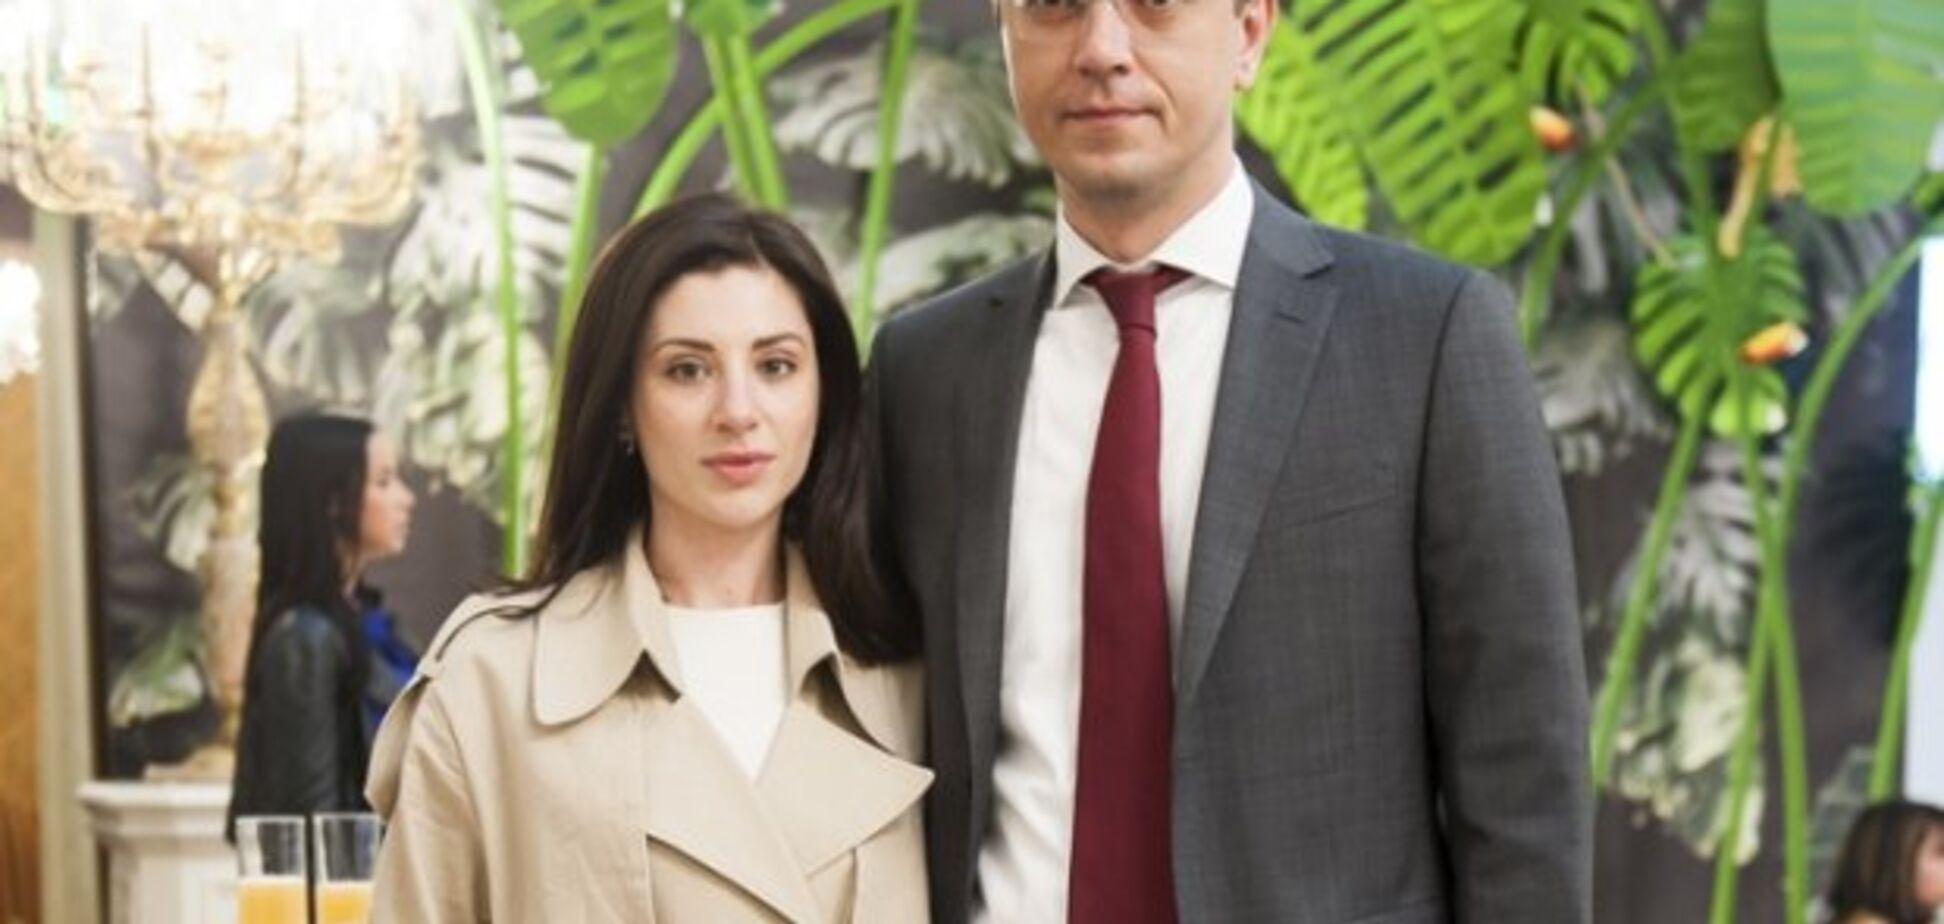 Дружина міністра? Українка замовила Maybach Coupe майже за 3 млн євро